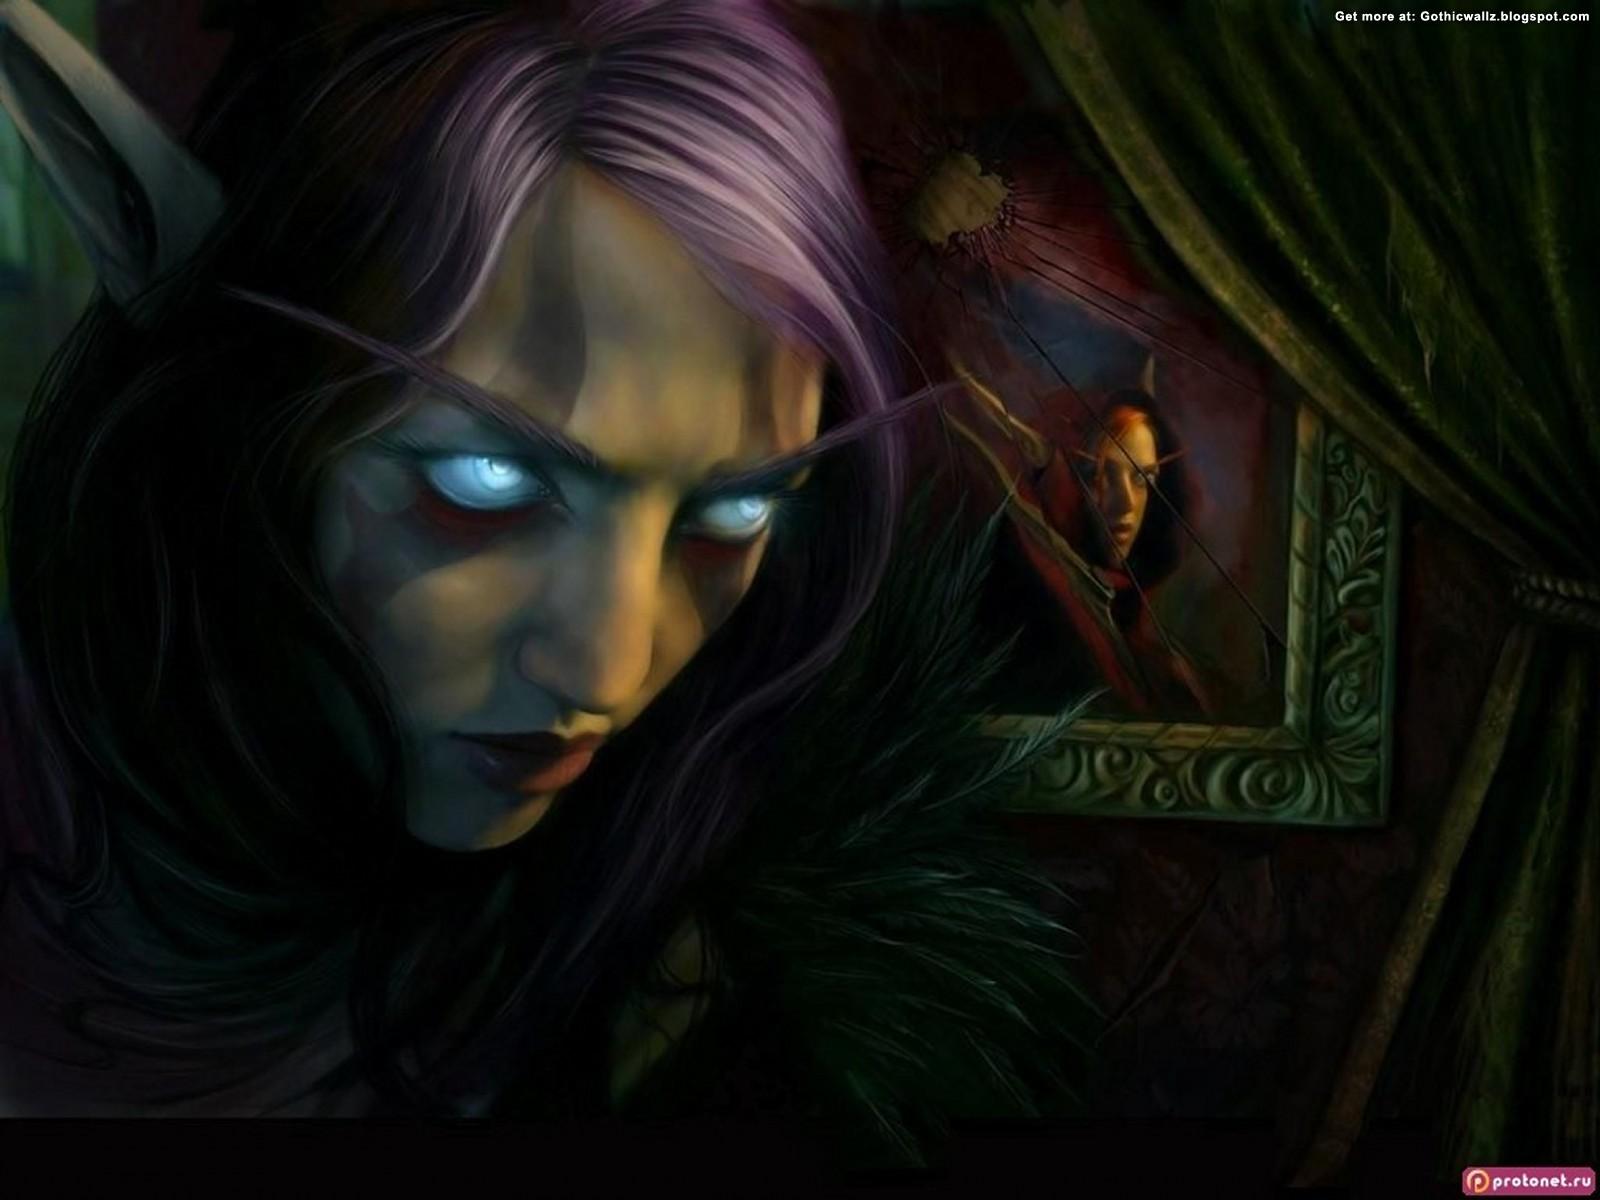 Evil look   Dark Gothic Wallpapers   FREE Gothic Wallpaper   Dark Art 1600x1200